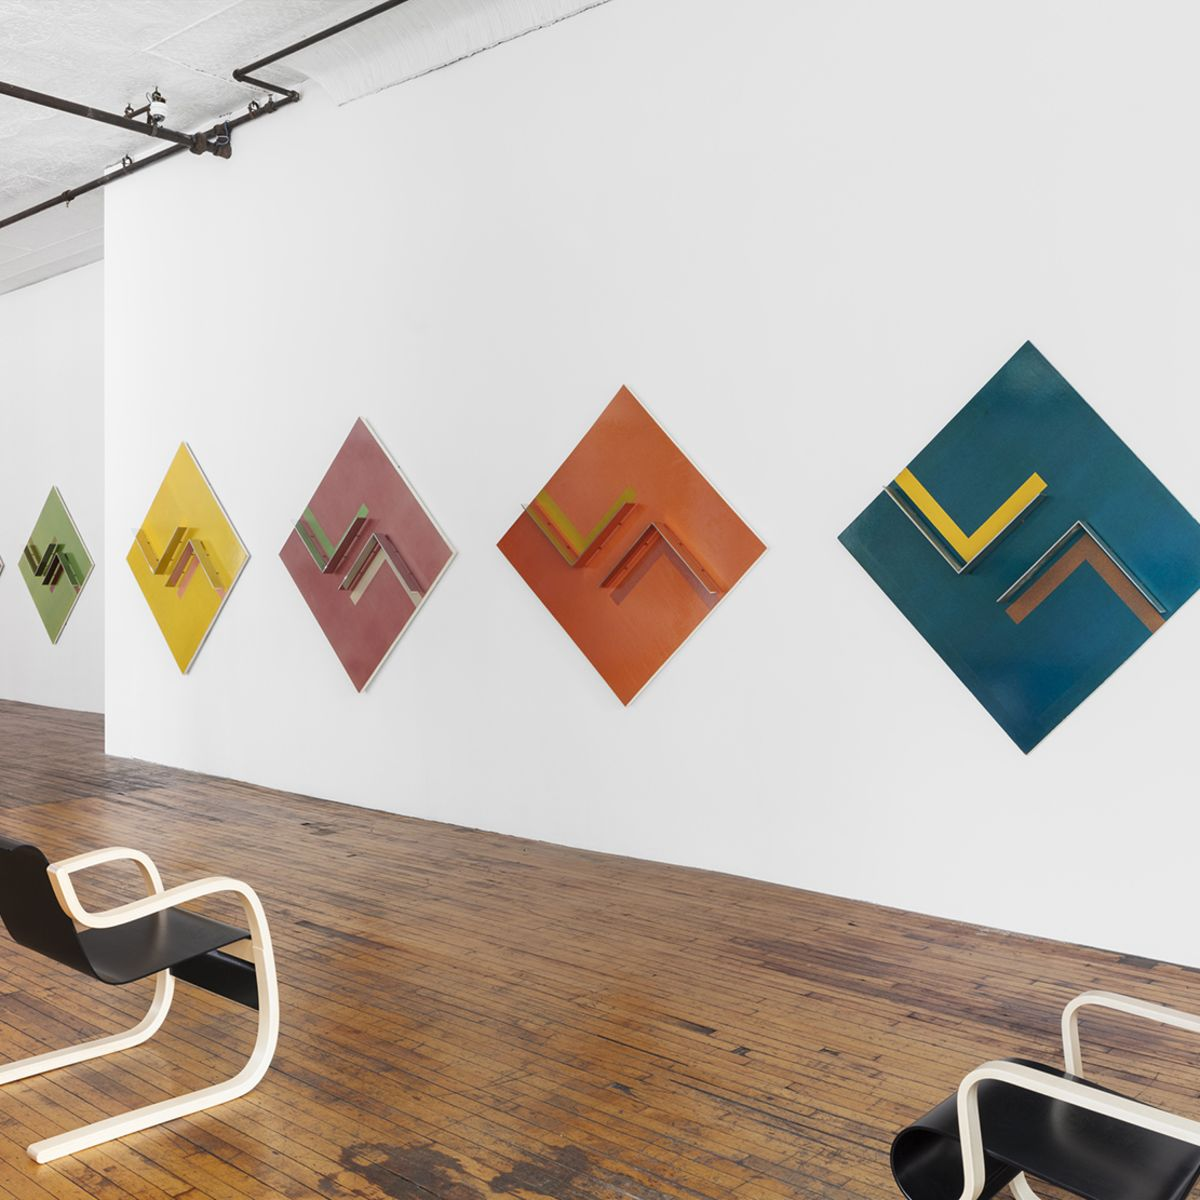 Aalto-Chamberlain-Installation-2-photo-Timothy-Doyon-copyright-Judd-Foundation